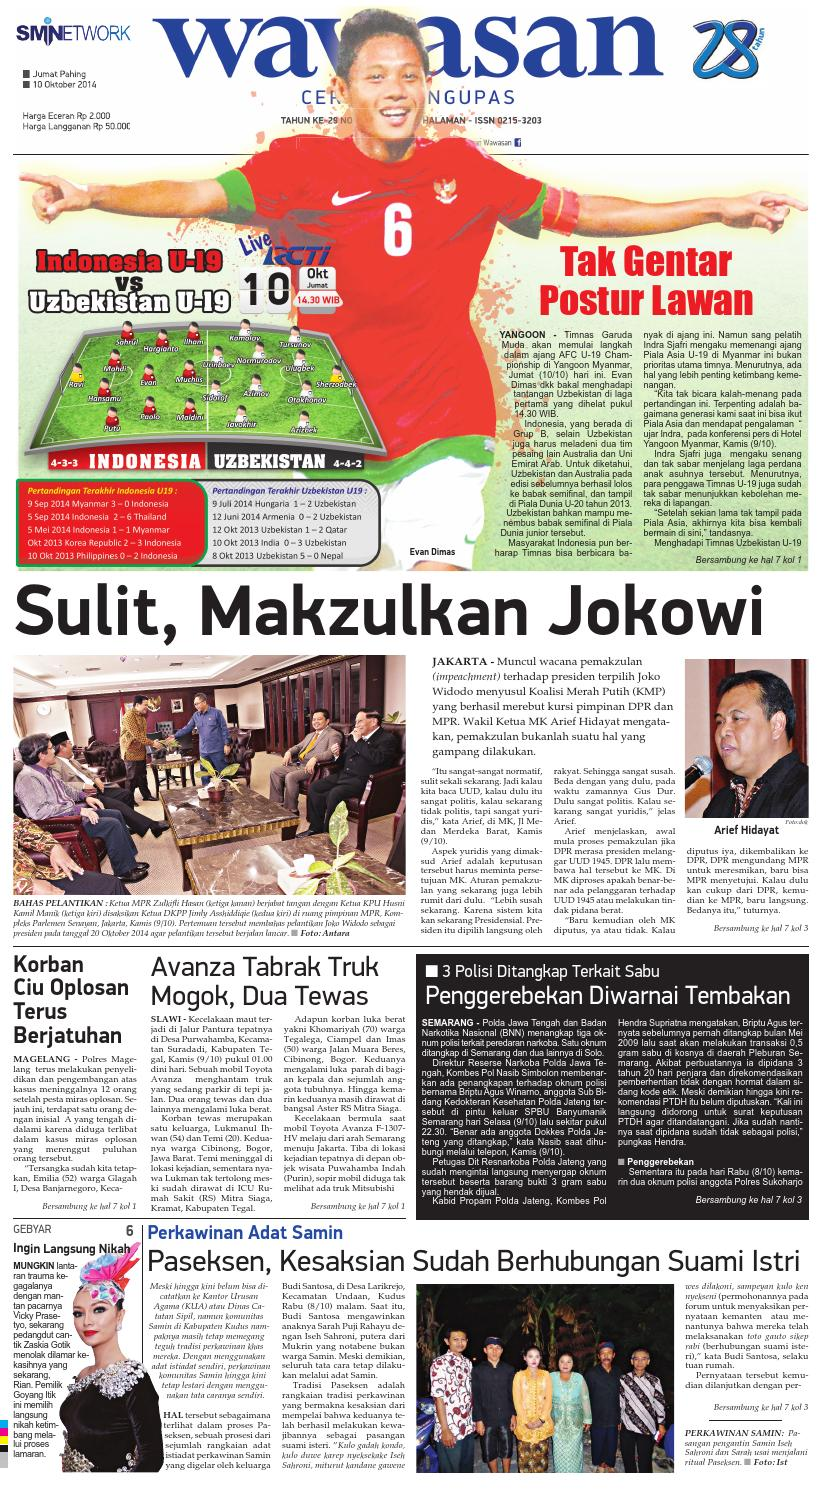 Wawasan 10 Oktober 2014 By Koran Pagi Issuu Produk Ukm Bumn Barbekyu Kelitik Surabaya